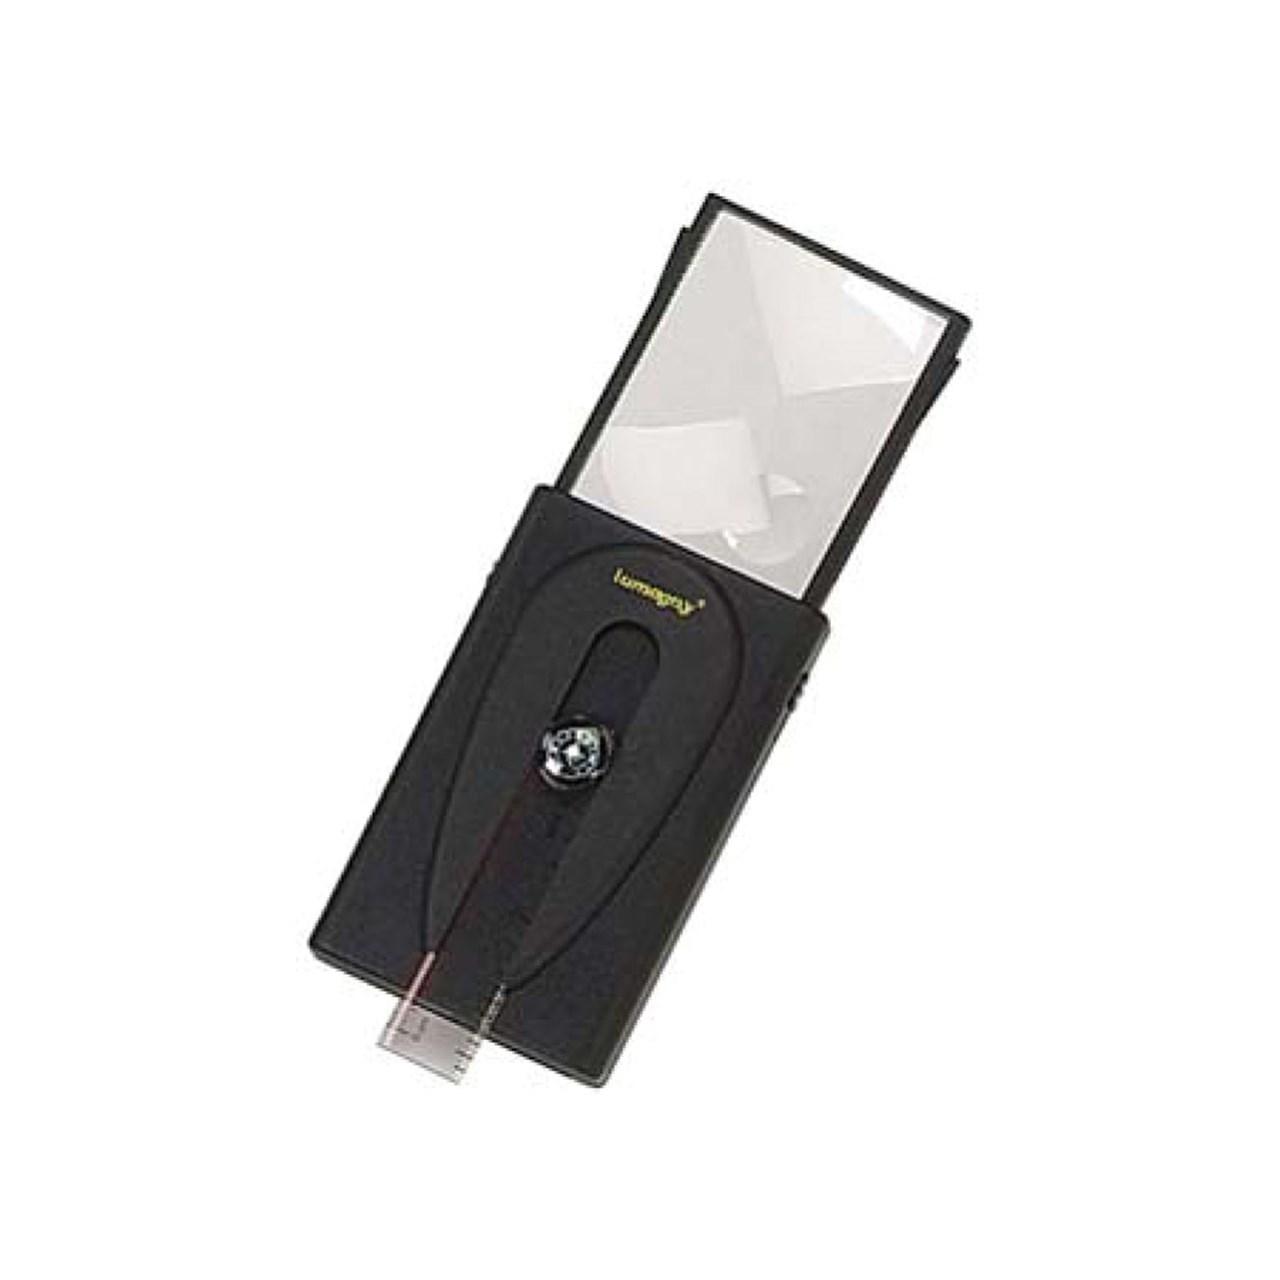 Reizen Illuminated Sliding Magnifier with Pop Up Lens - 2x or 5x